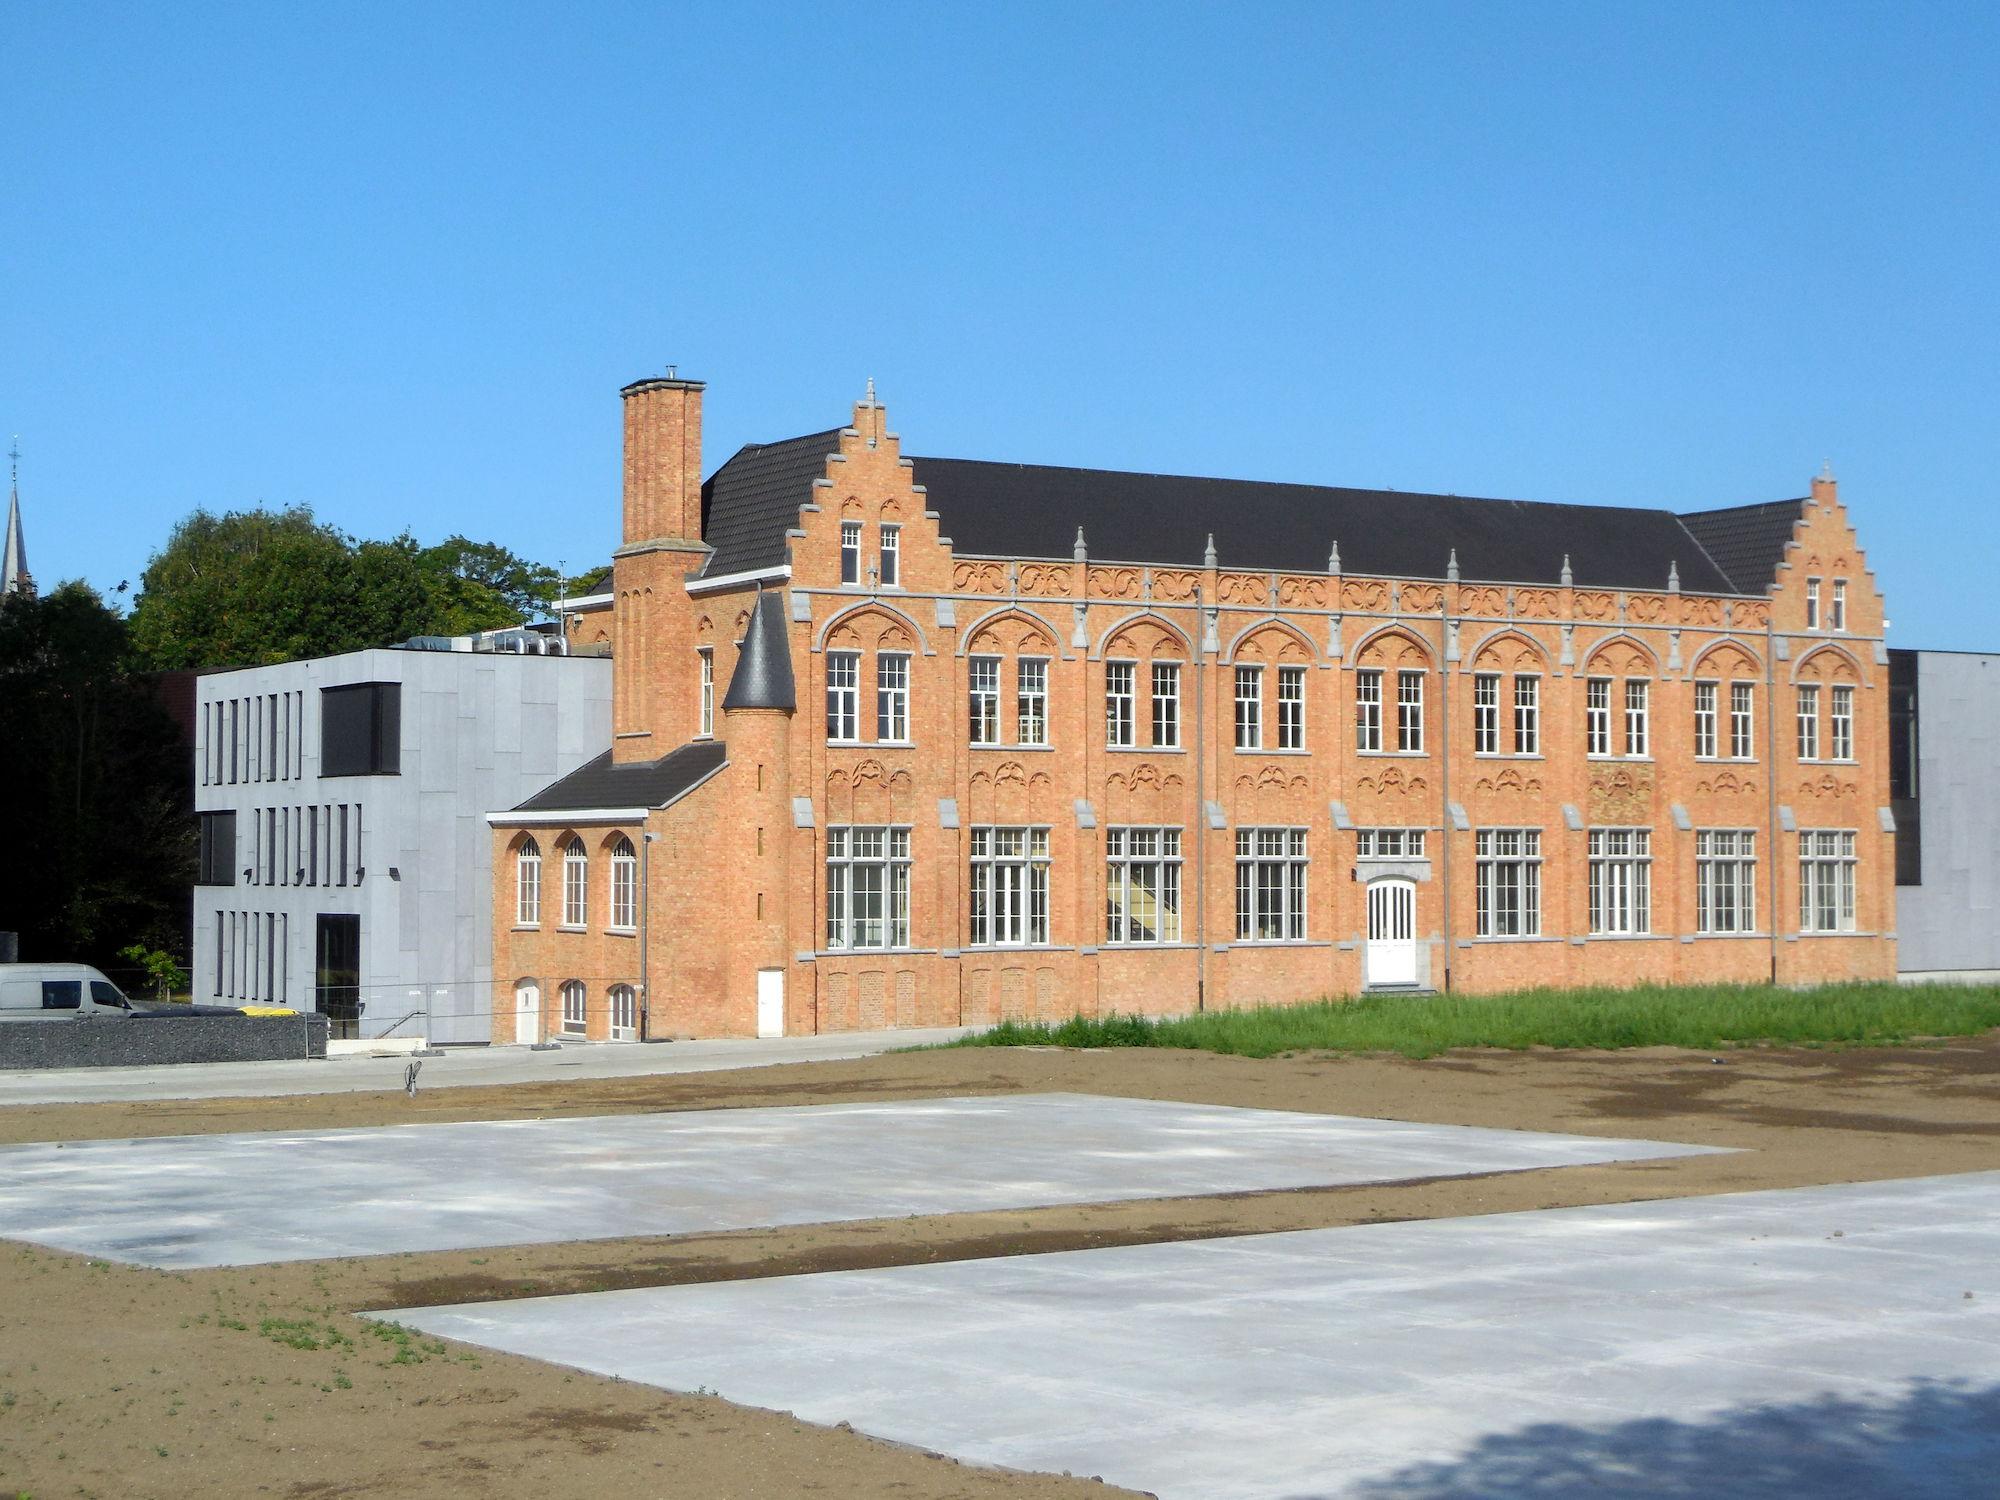 Guldensporencollege Kaai 2019